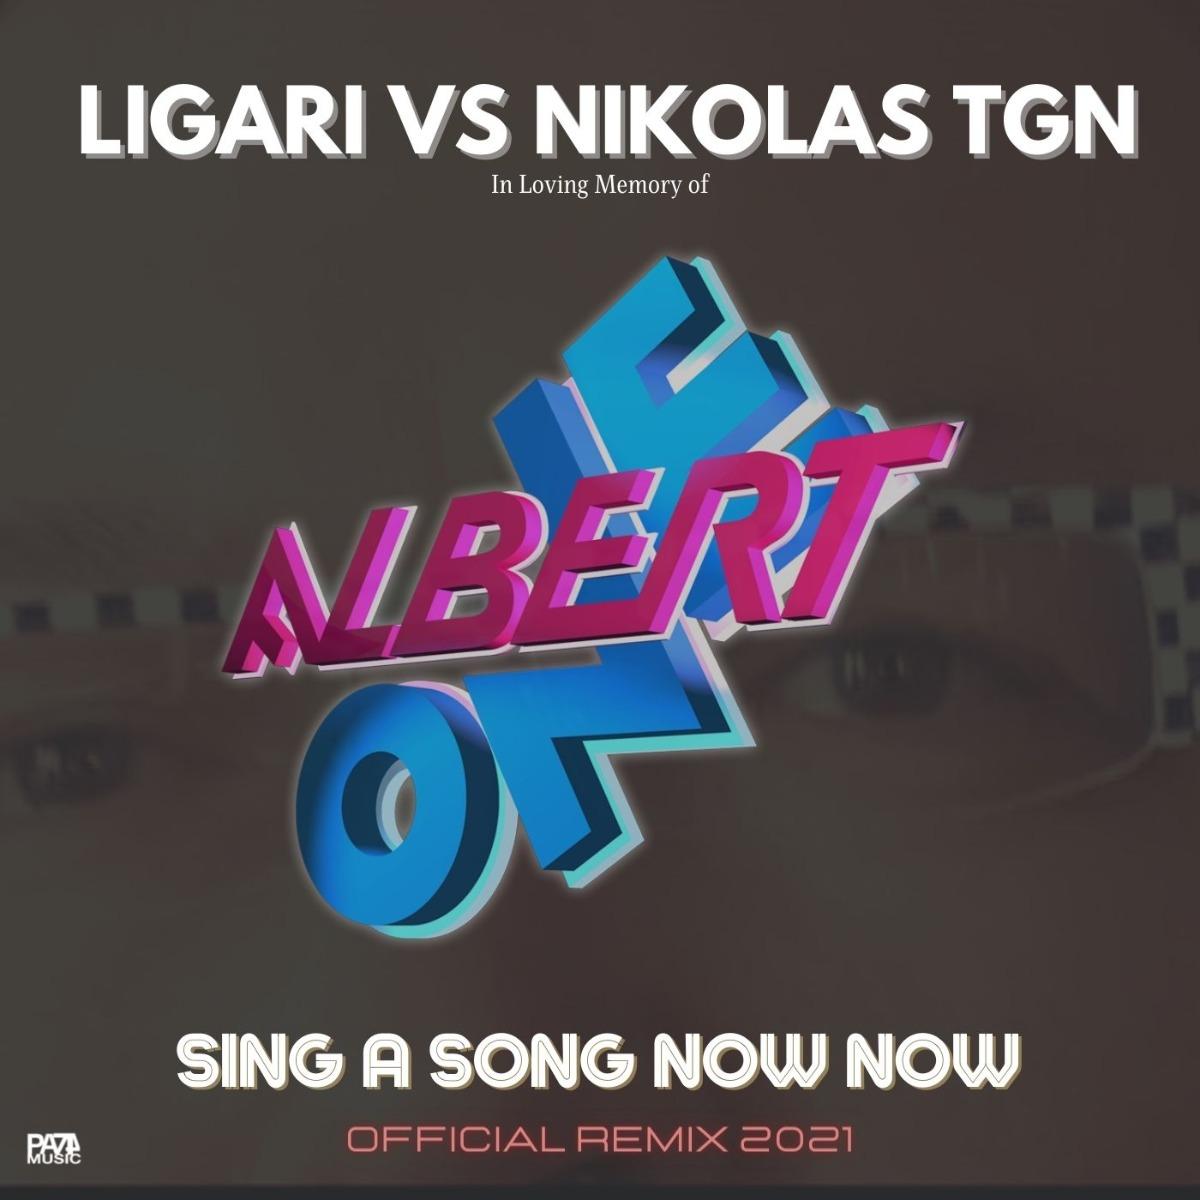 "LIGARI vs NIKOLAS TGN ""Sing a Song Now Now"" (Remix 2021)"